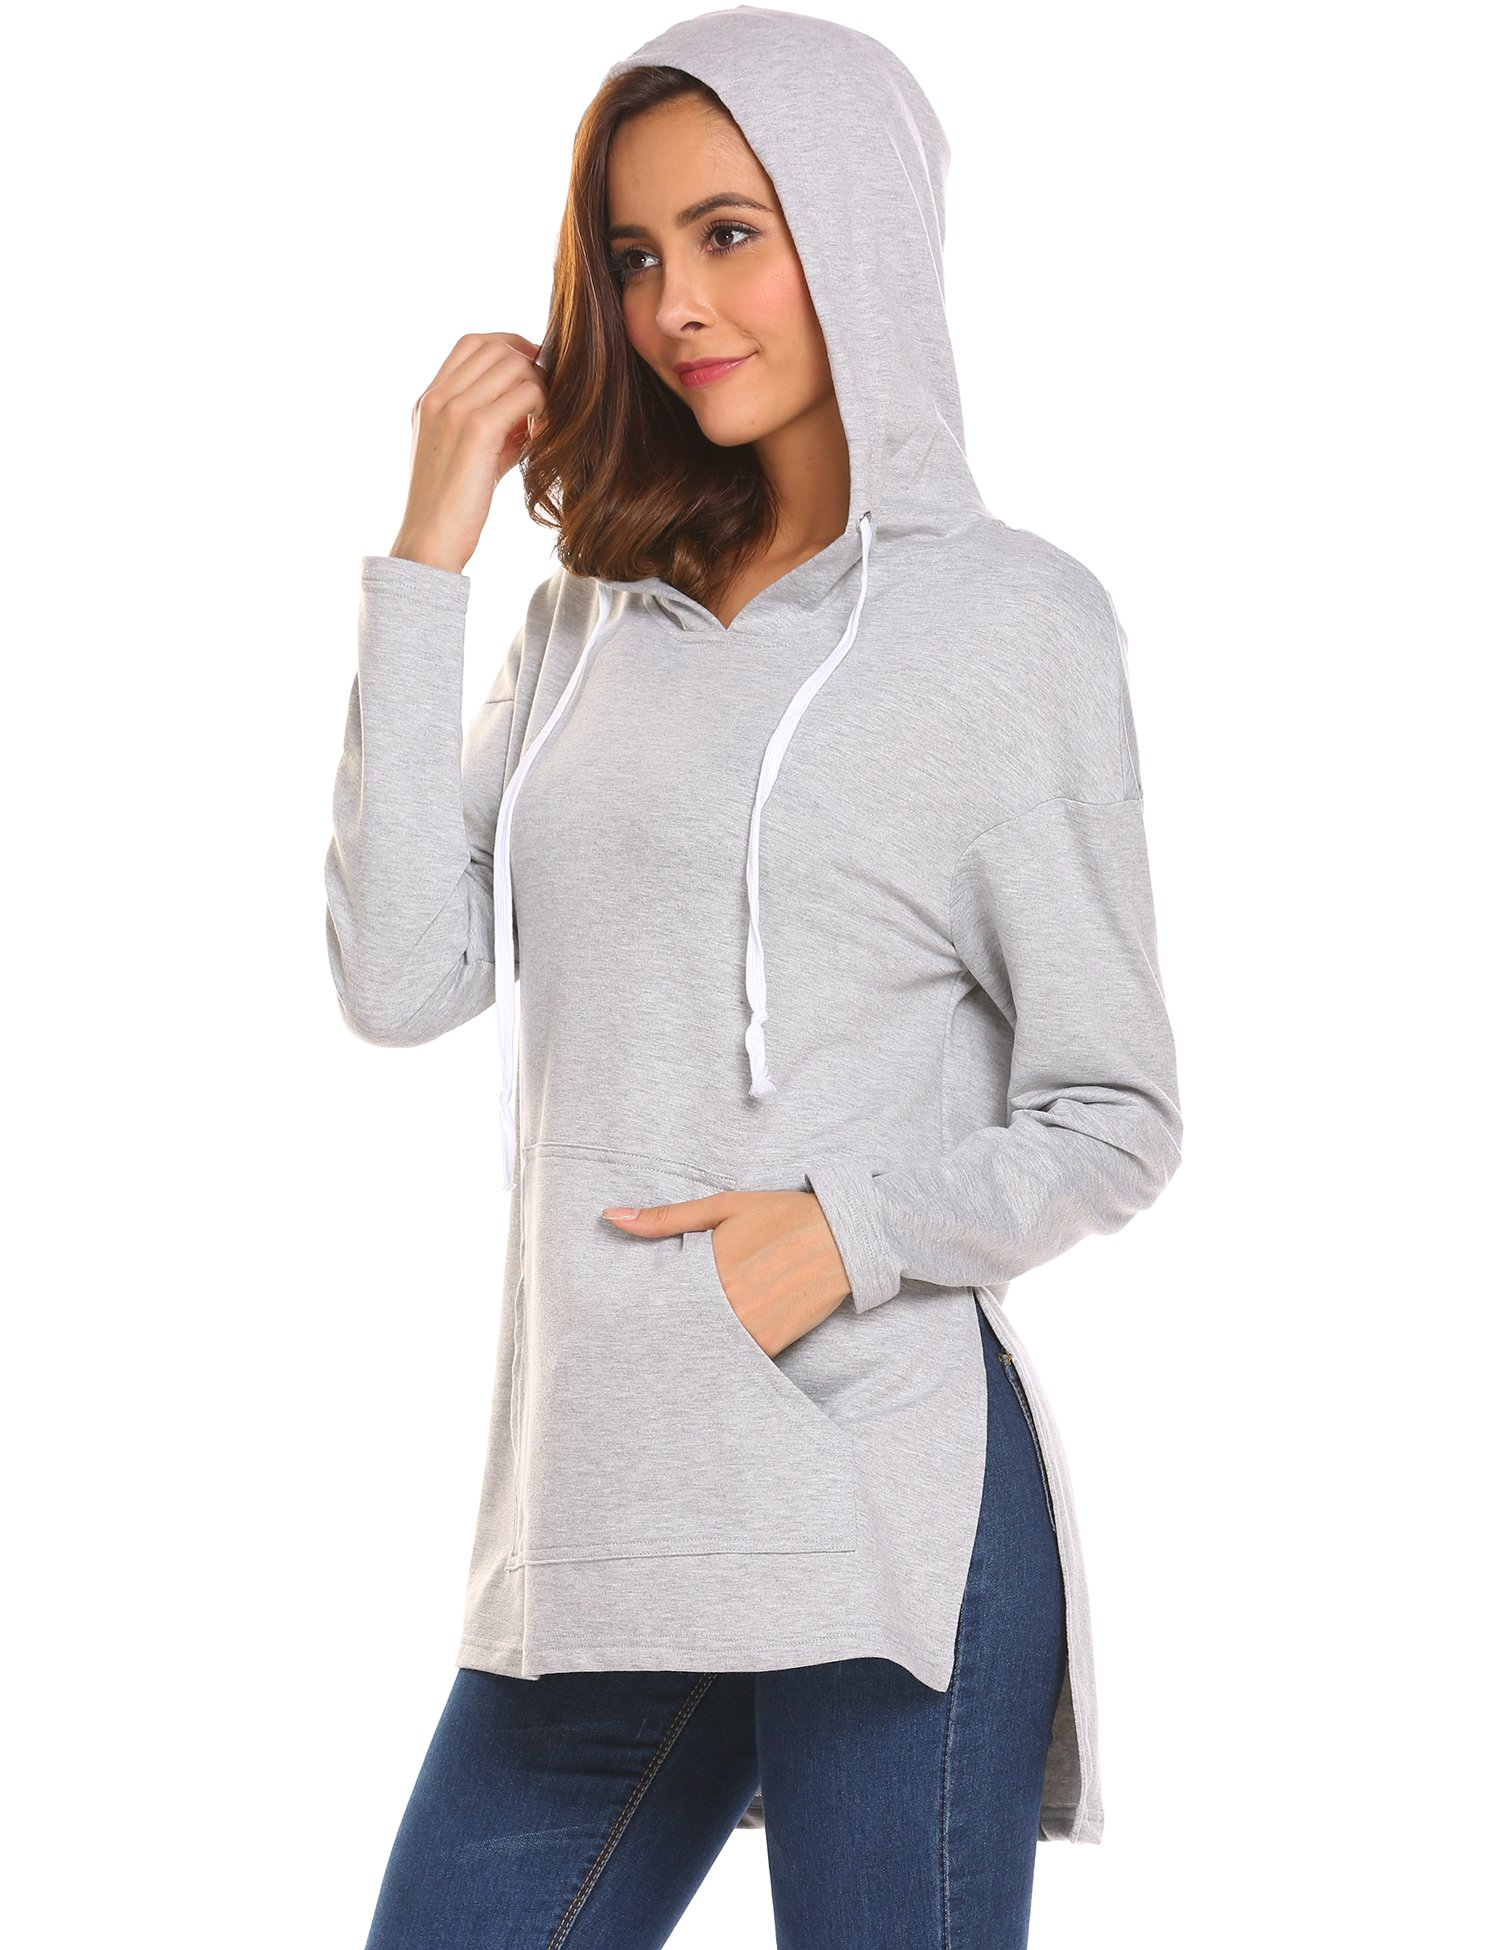 Miageek Womens's Side Slit Pullover Ribbed Drawstring Sweatshirt Hoodie